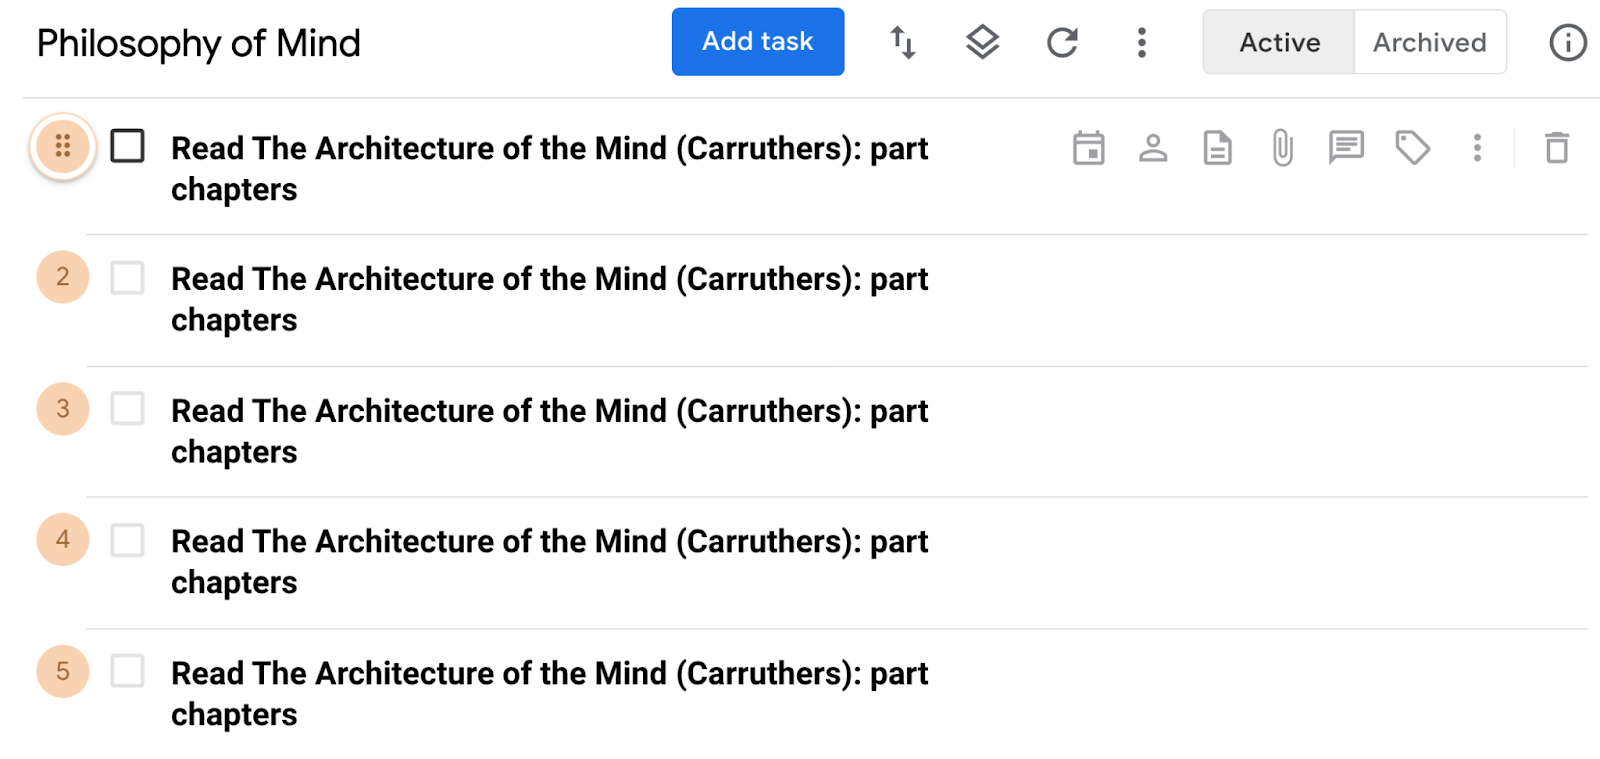 Copies of duplicated task